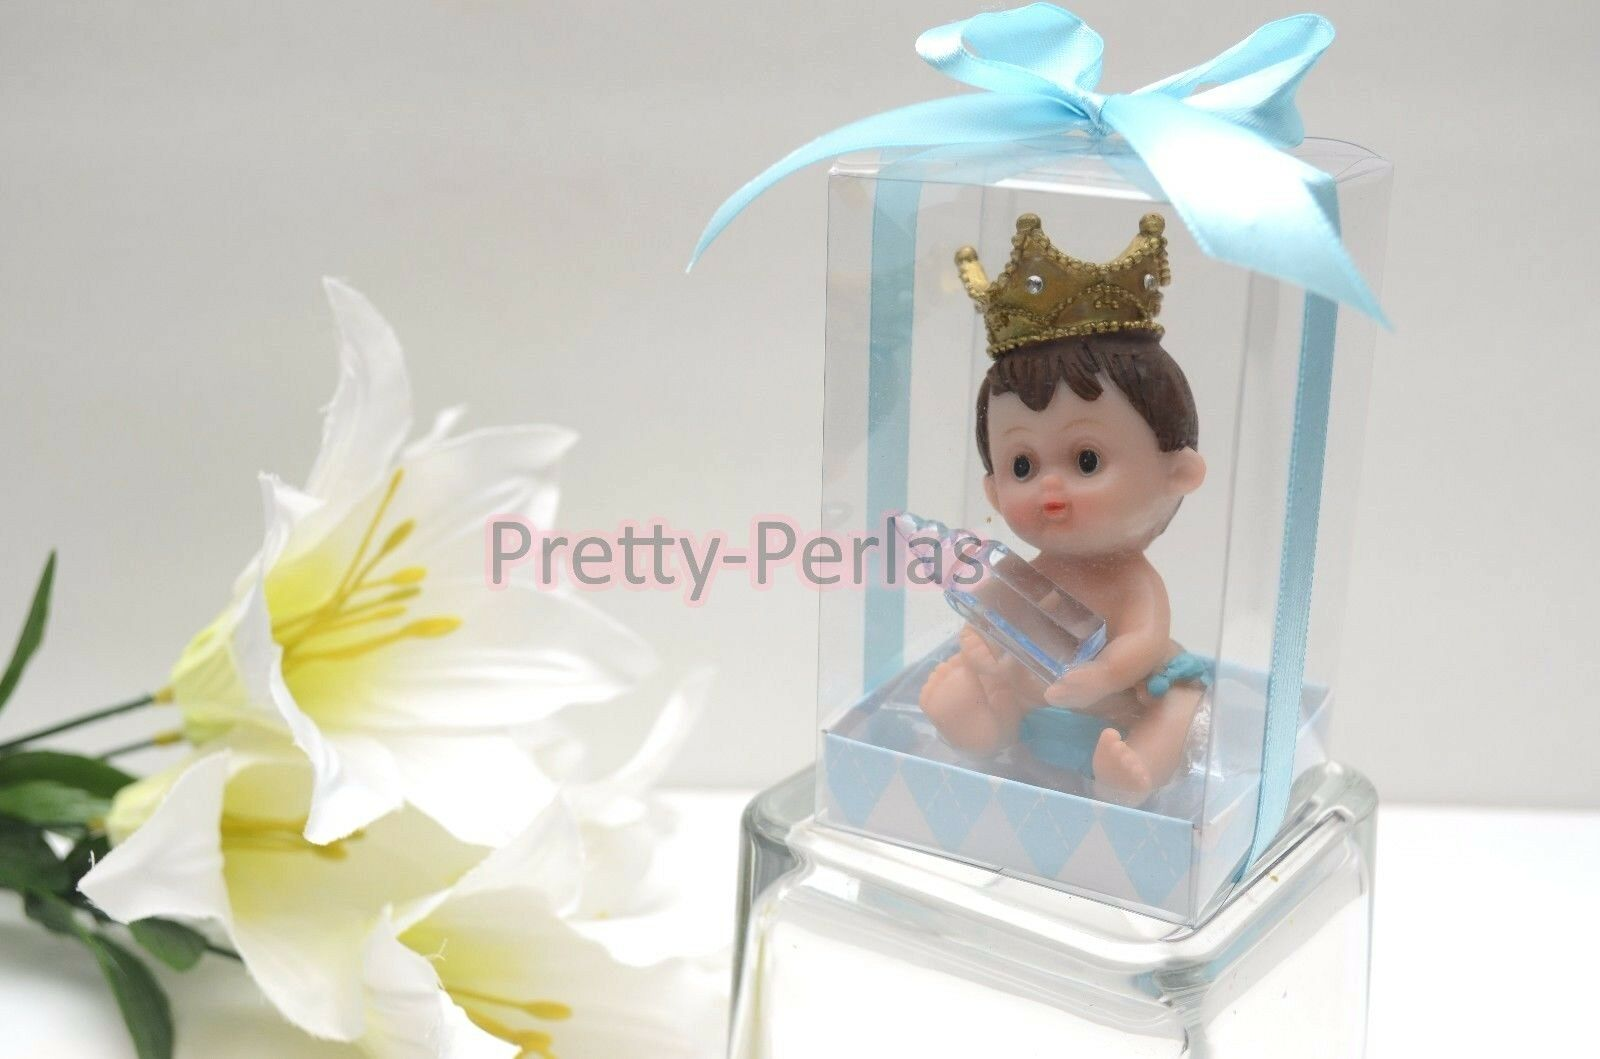 18PC Baby Shower Party Favors Figurines Boy Blau Recuerdos De Nino Decorations